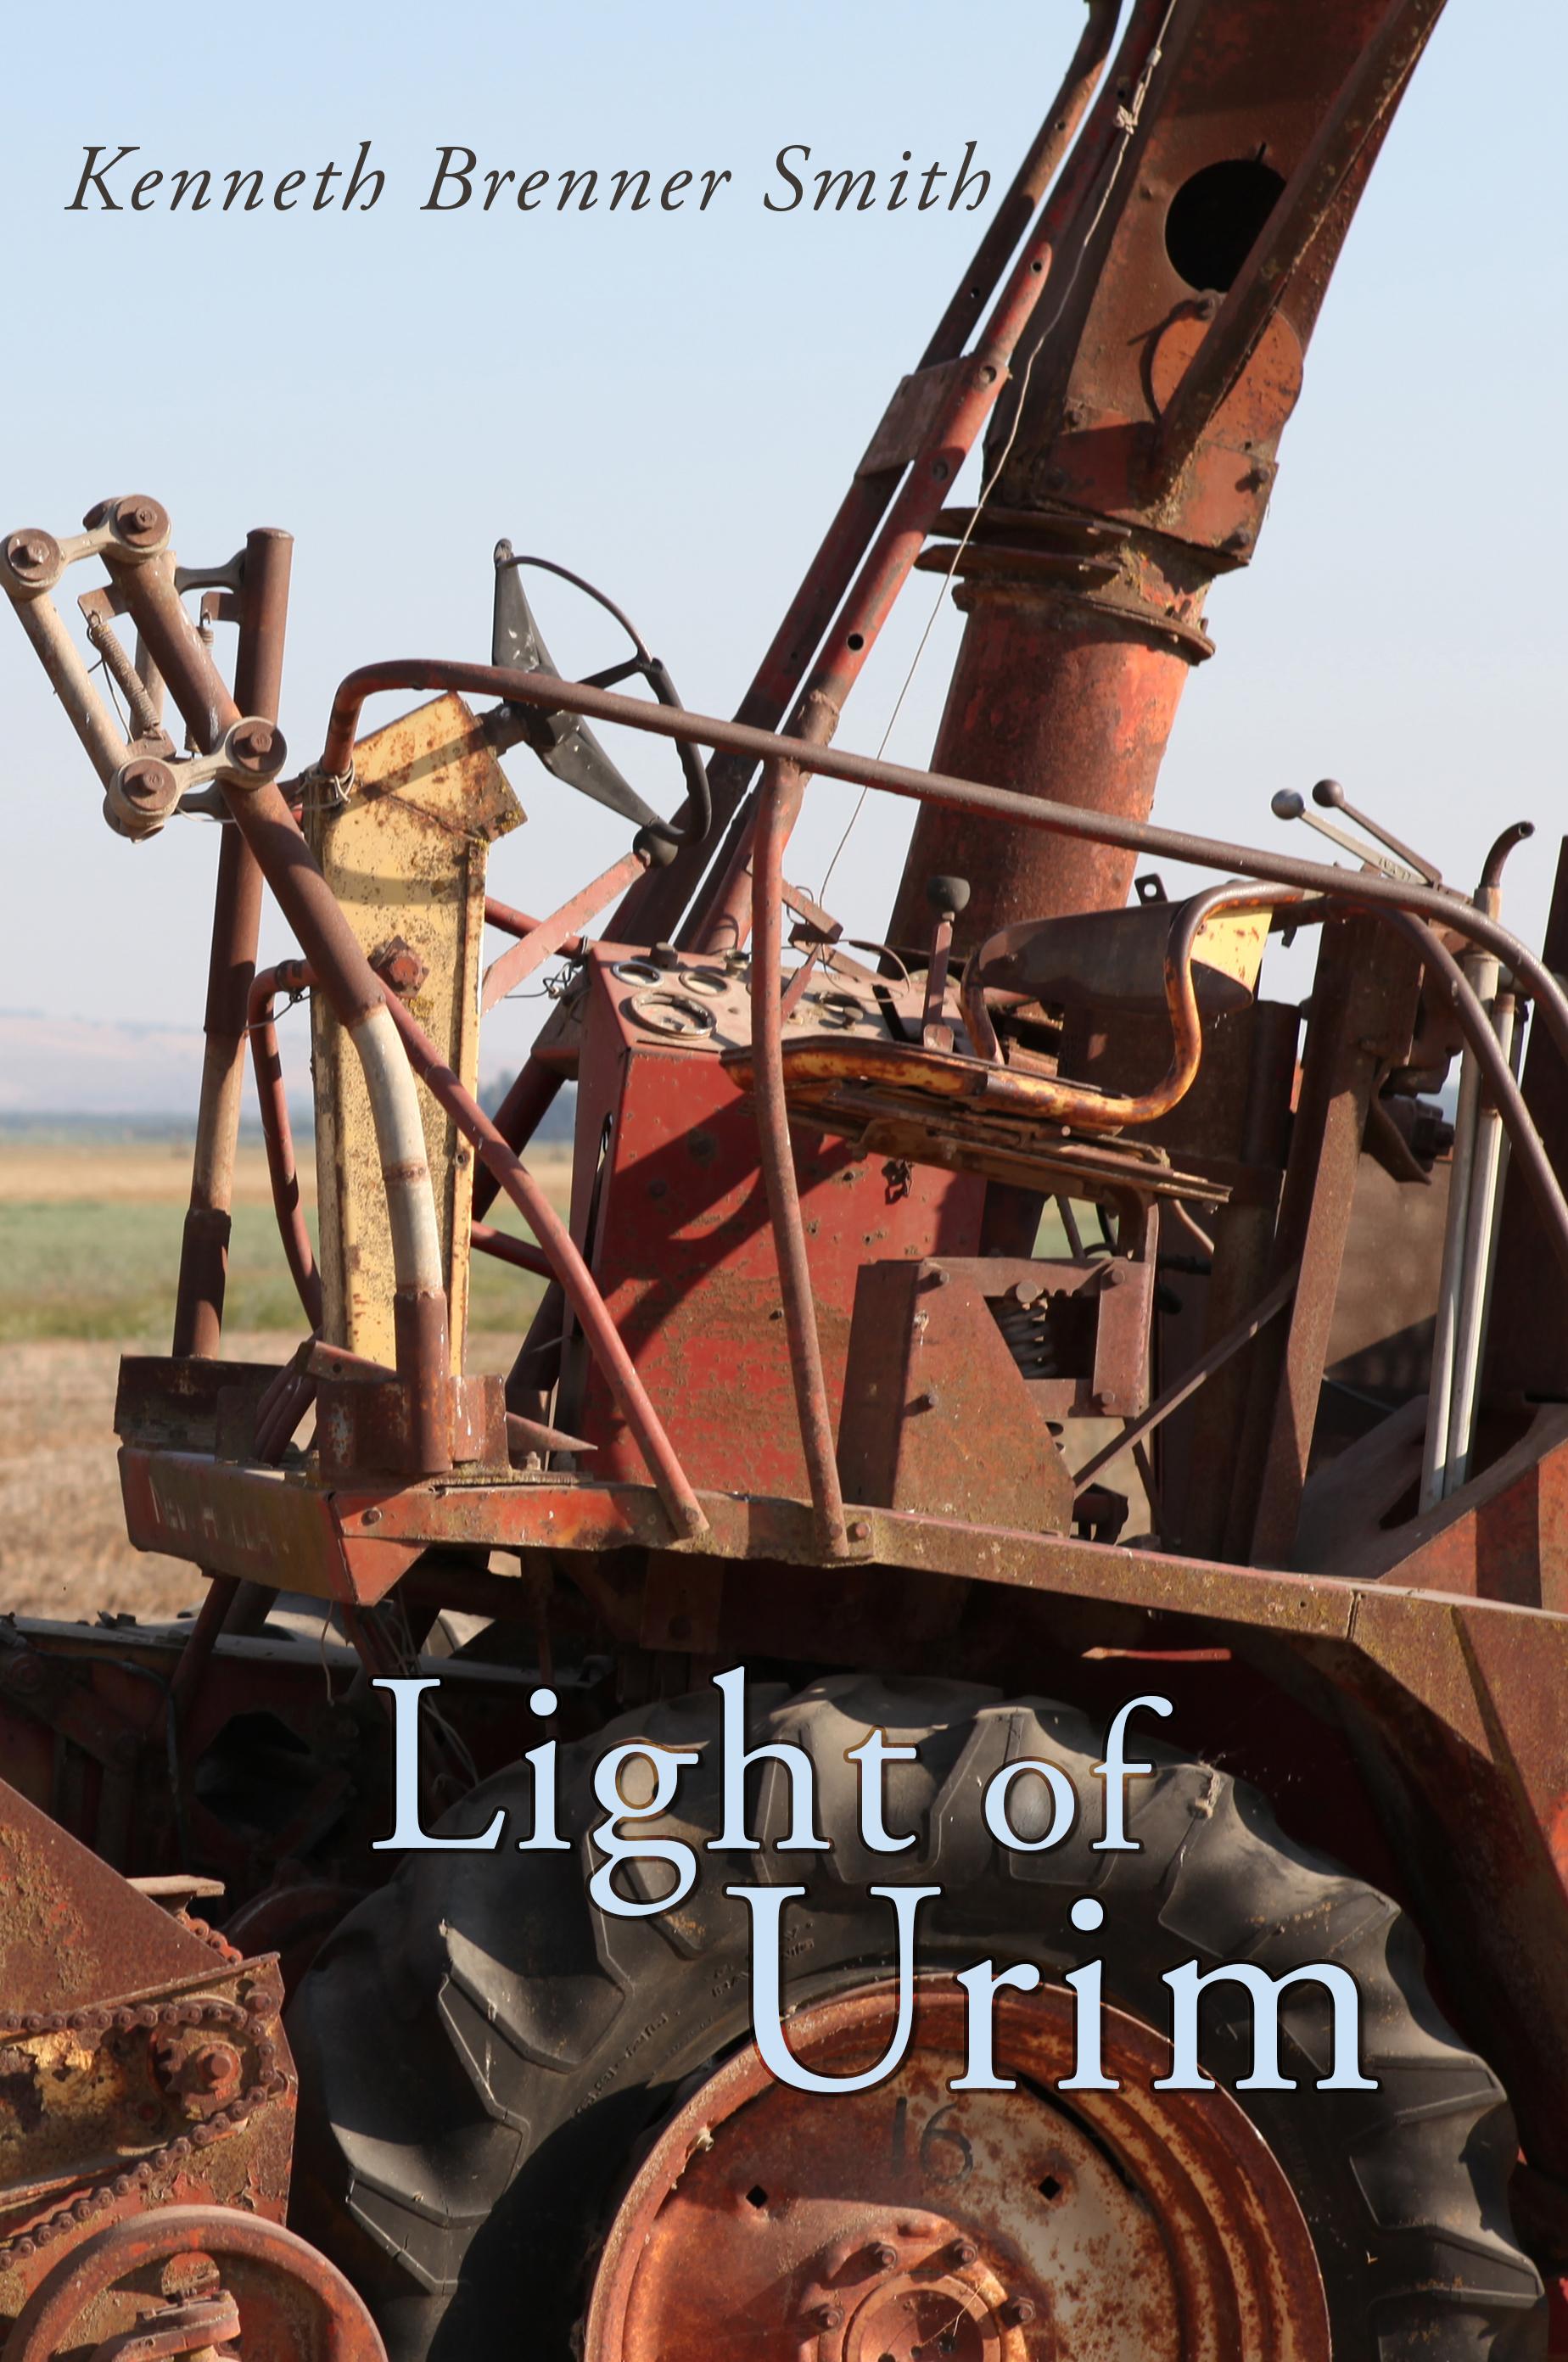 Light of Urim